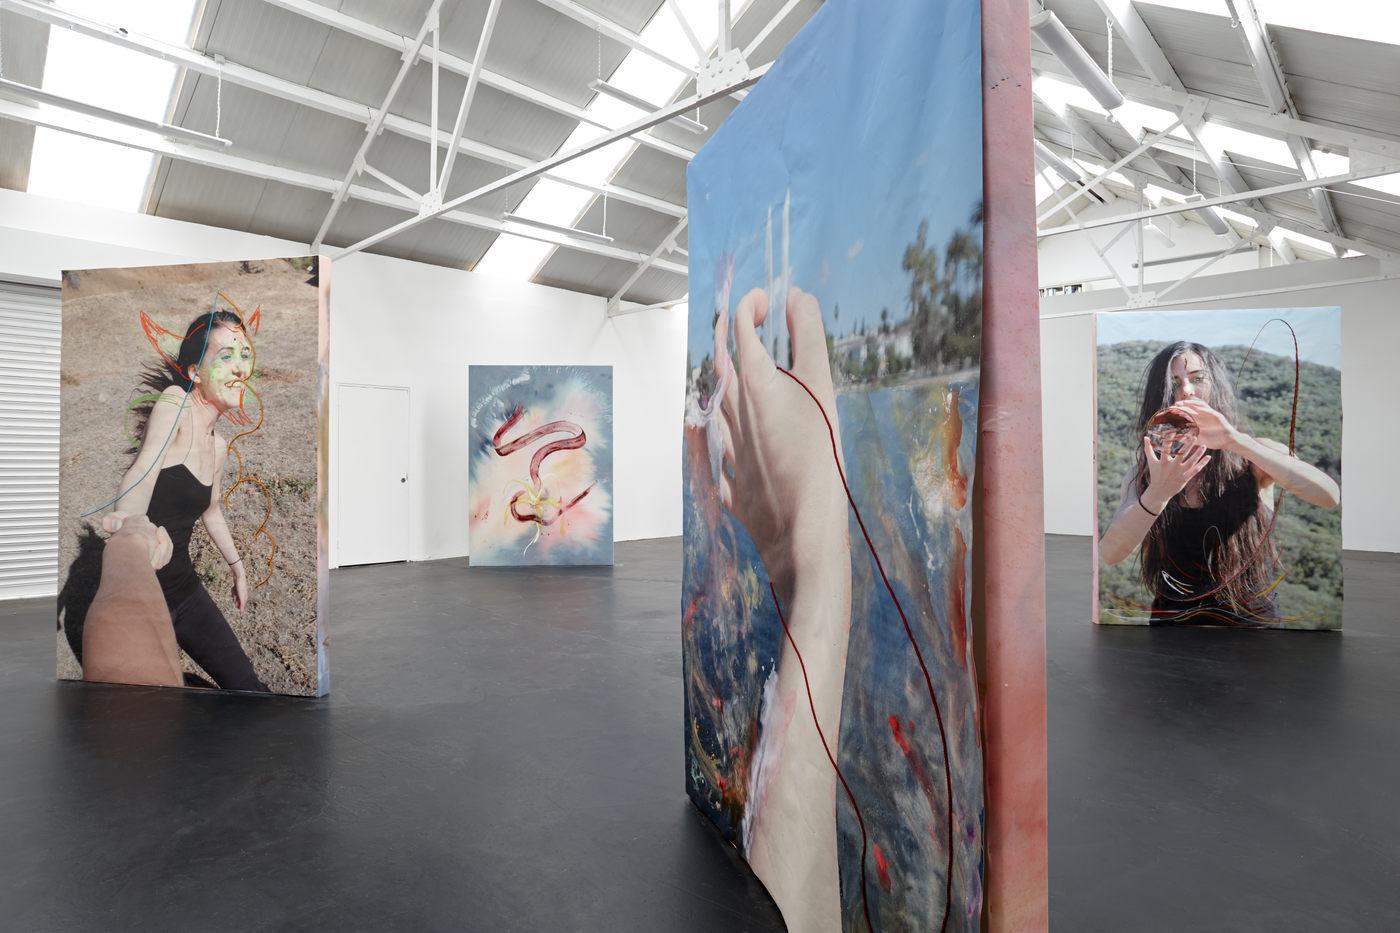 09. Nora Berman - Charm - Installation View IX